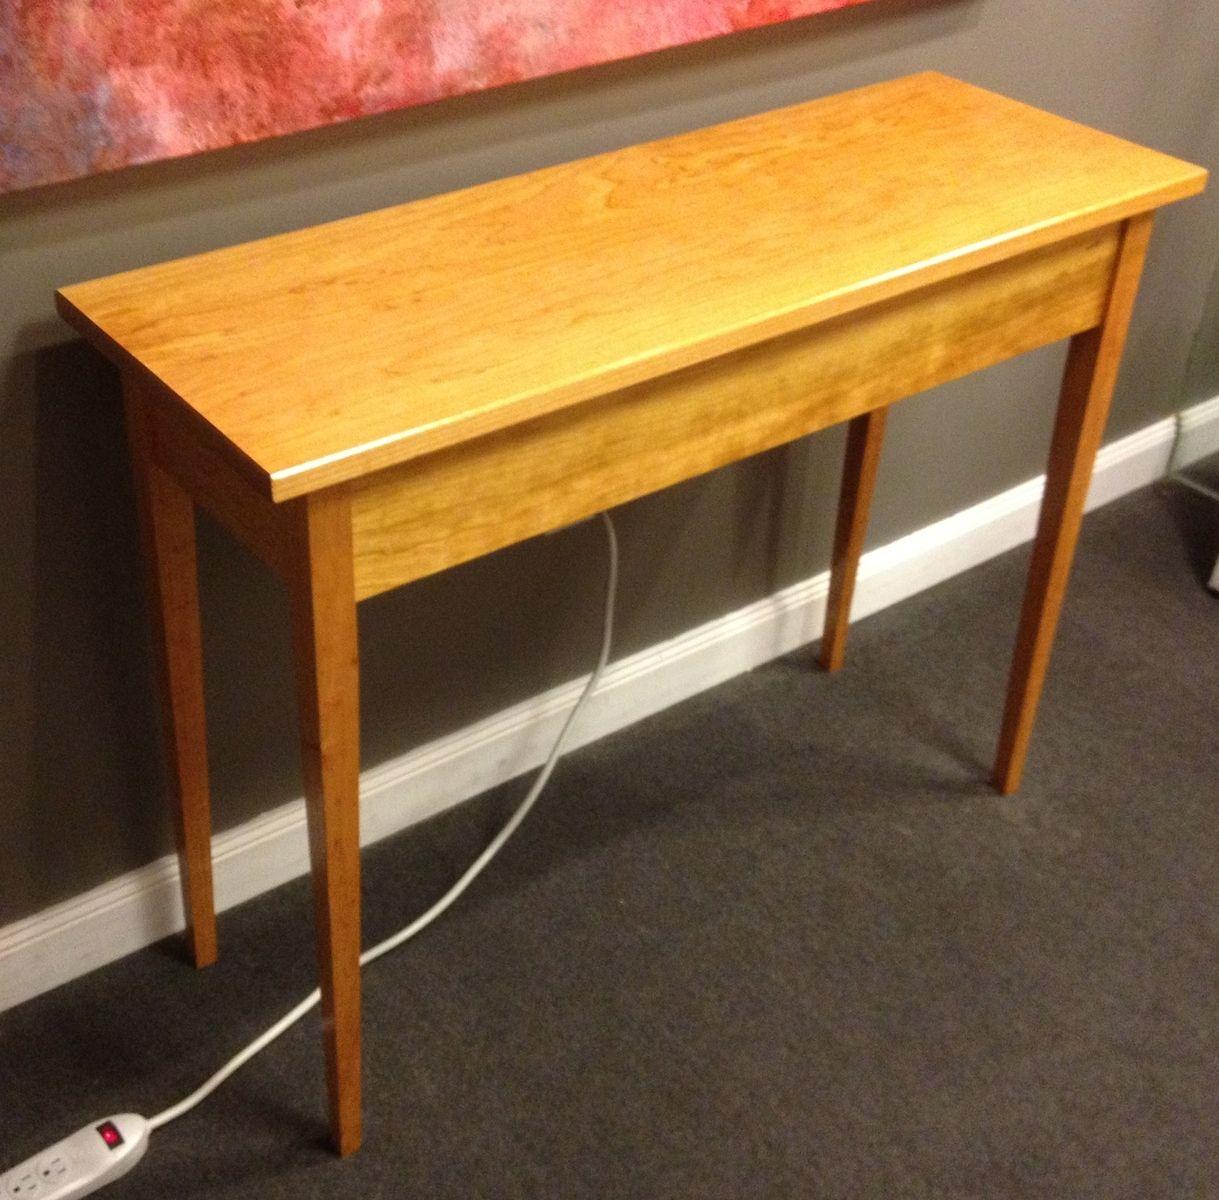 Unique Sofa Tables: Custom Made Sofa Table By Collin's Custom Furniture